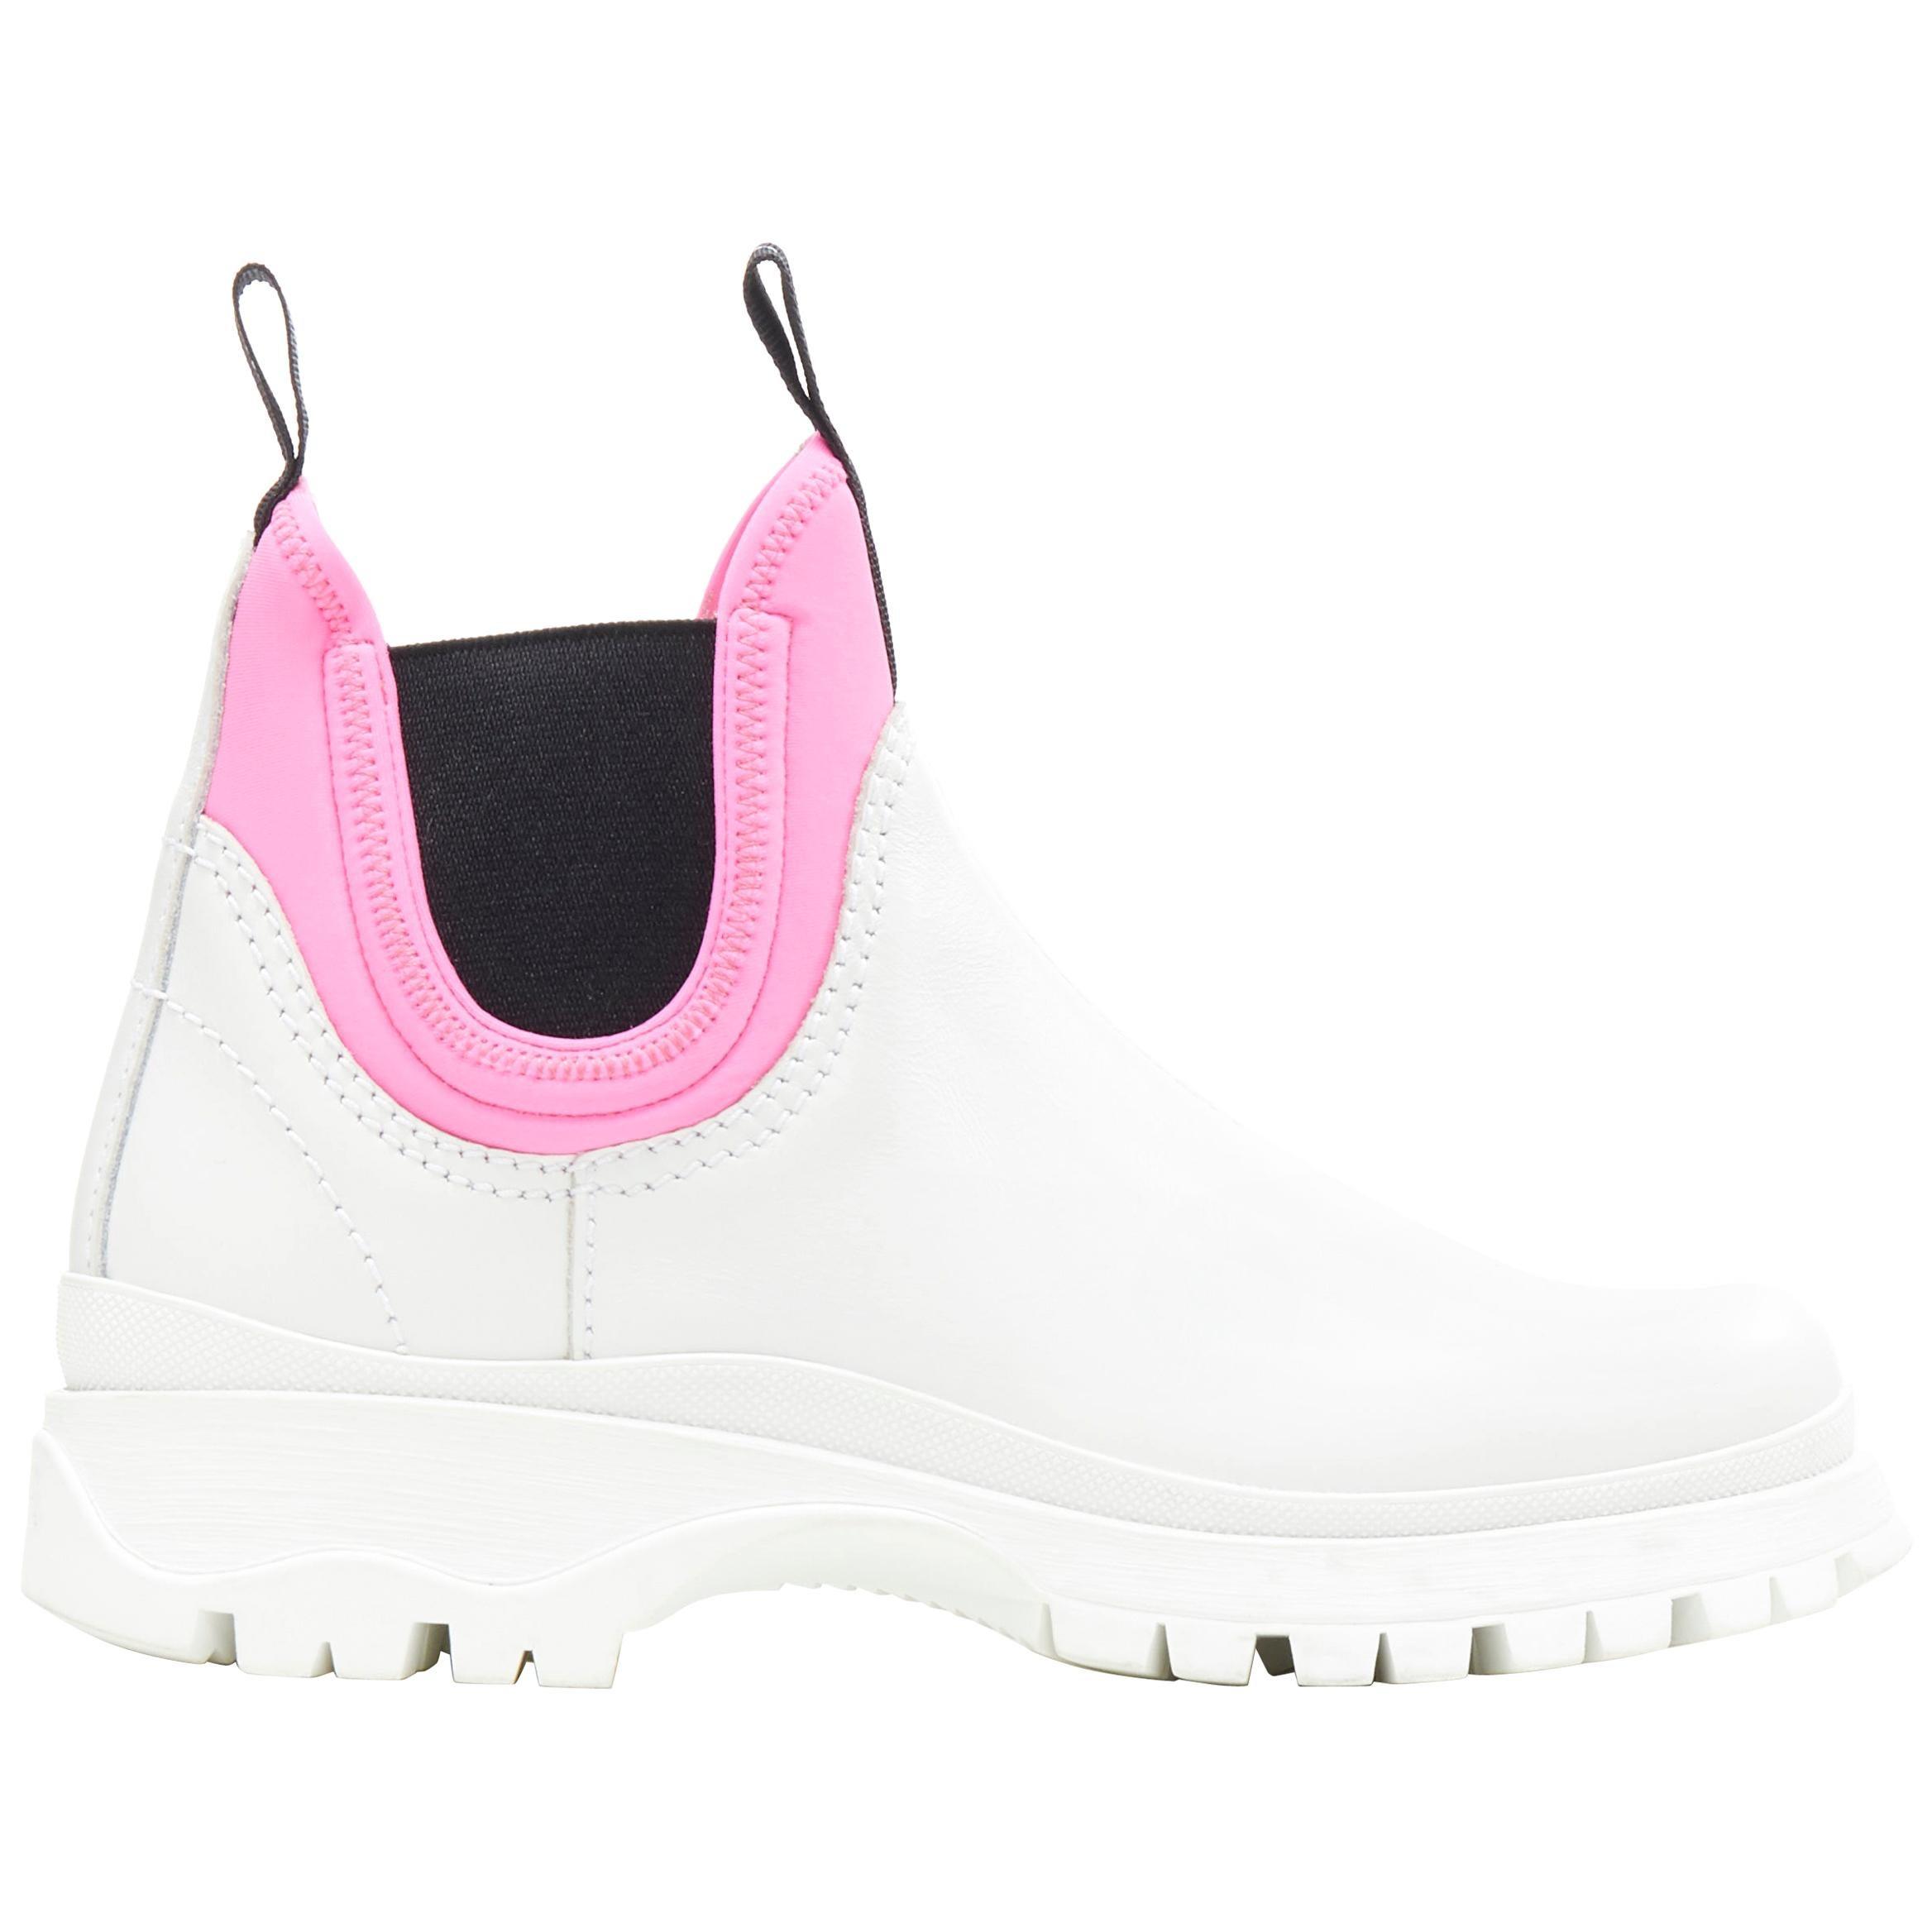 new PRADA 2018 Runway neon pink neoprene white leather ankle chelsea boot EU38.5